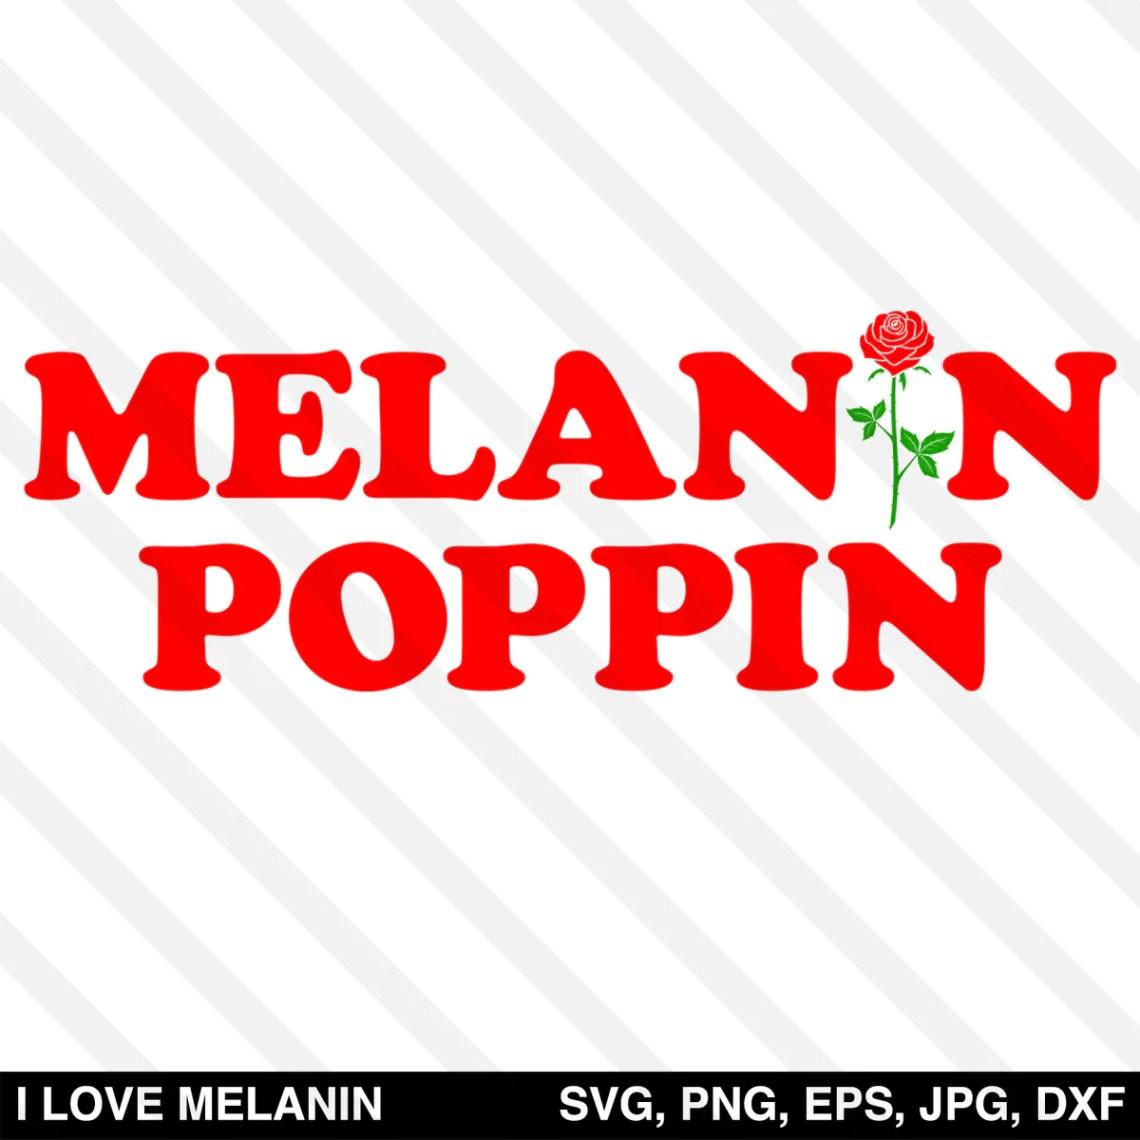 Download Melanin Poppin Rose SVG - I Love Melanin